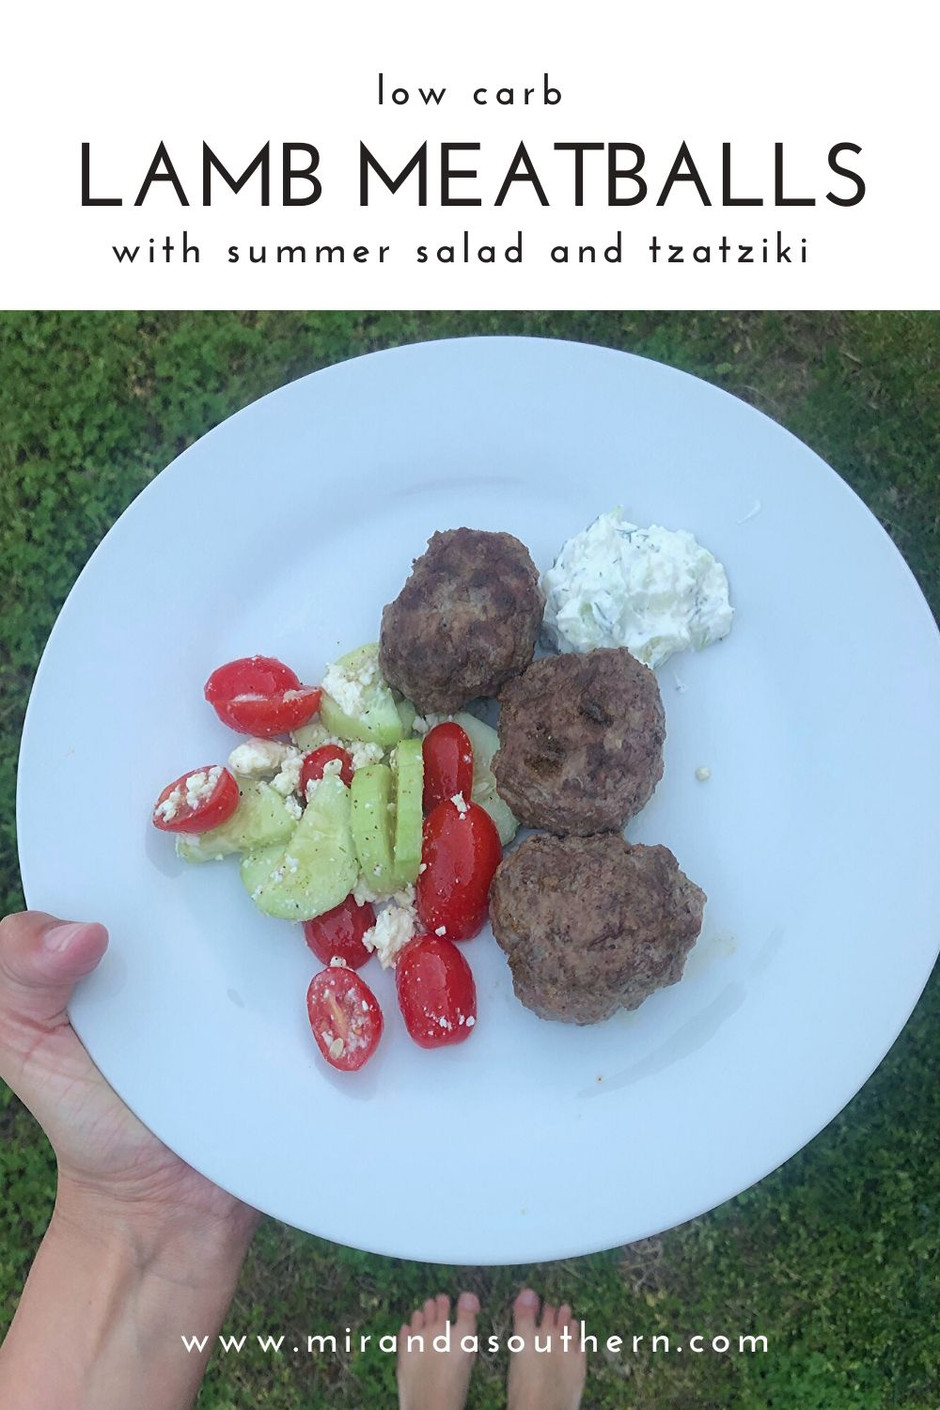 Lamb Meatballs with summer salad & tzatziki {recipe}